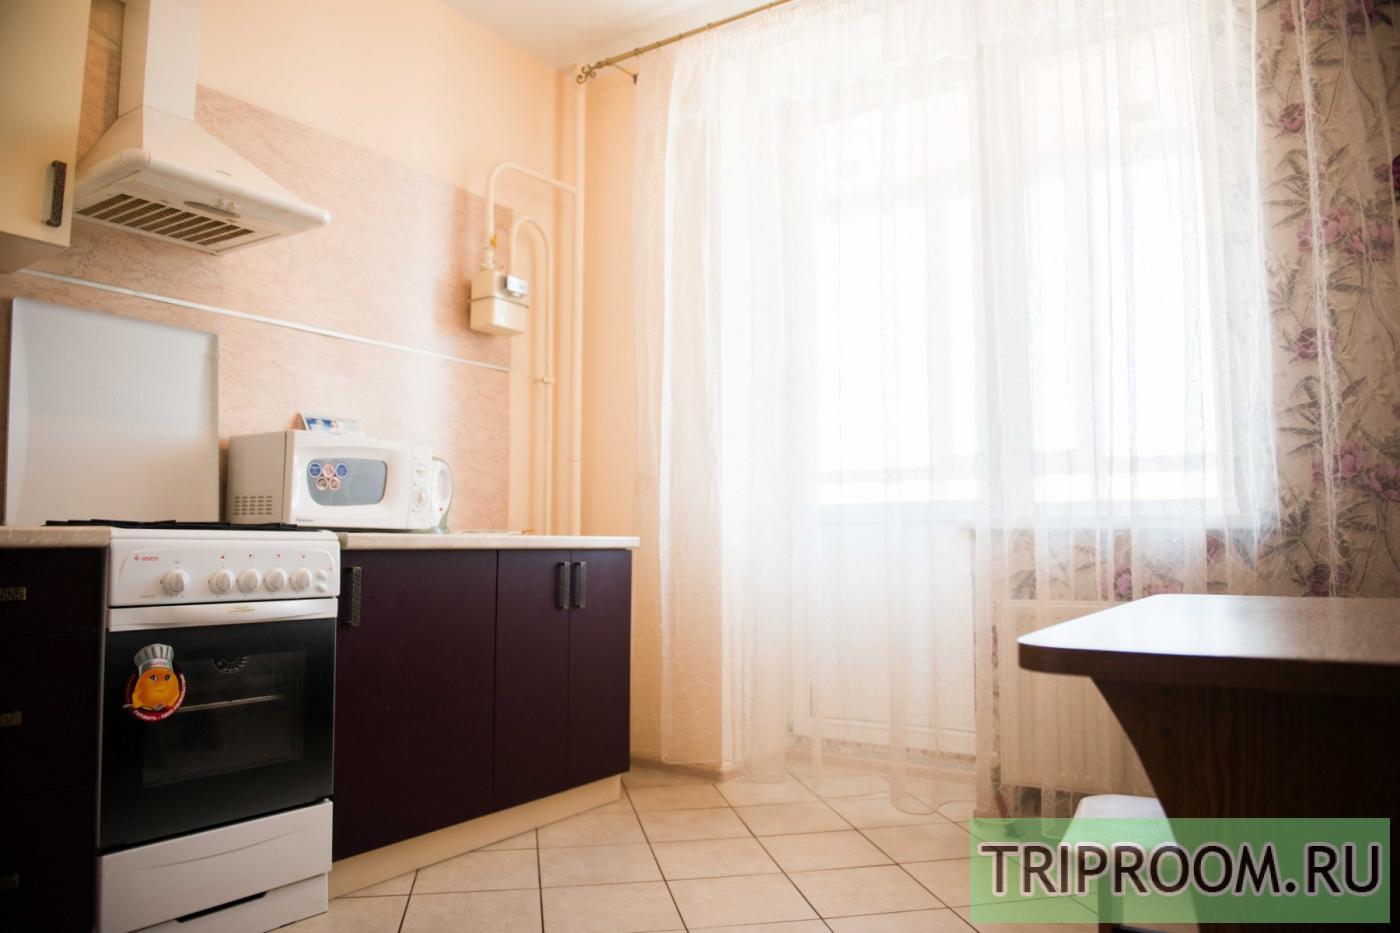 1-комнатная квартира посуточно (вариант № 32598), ул. Гарабурды улица, фото № 8